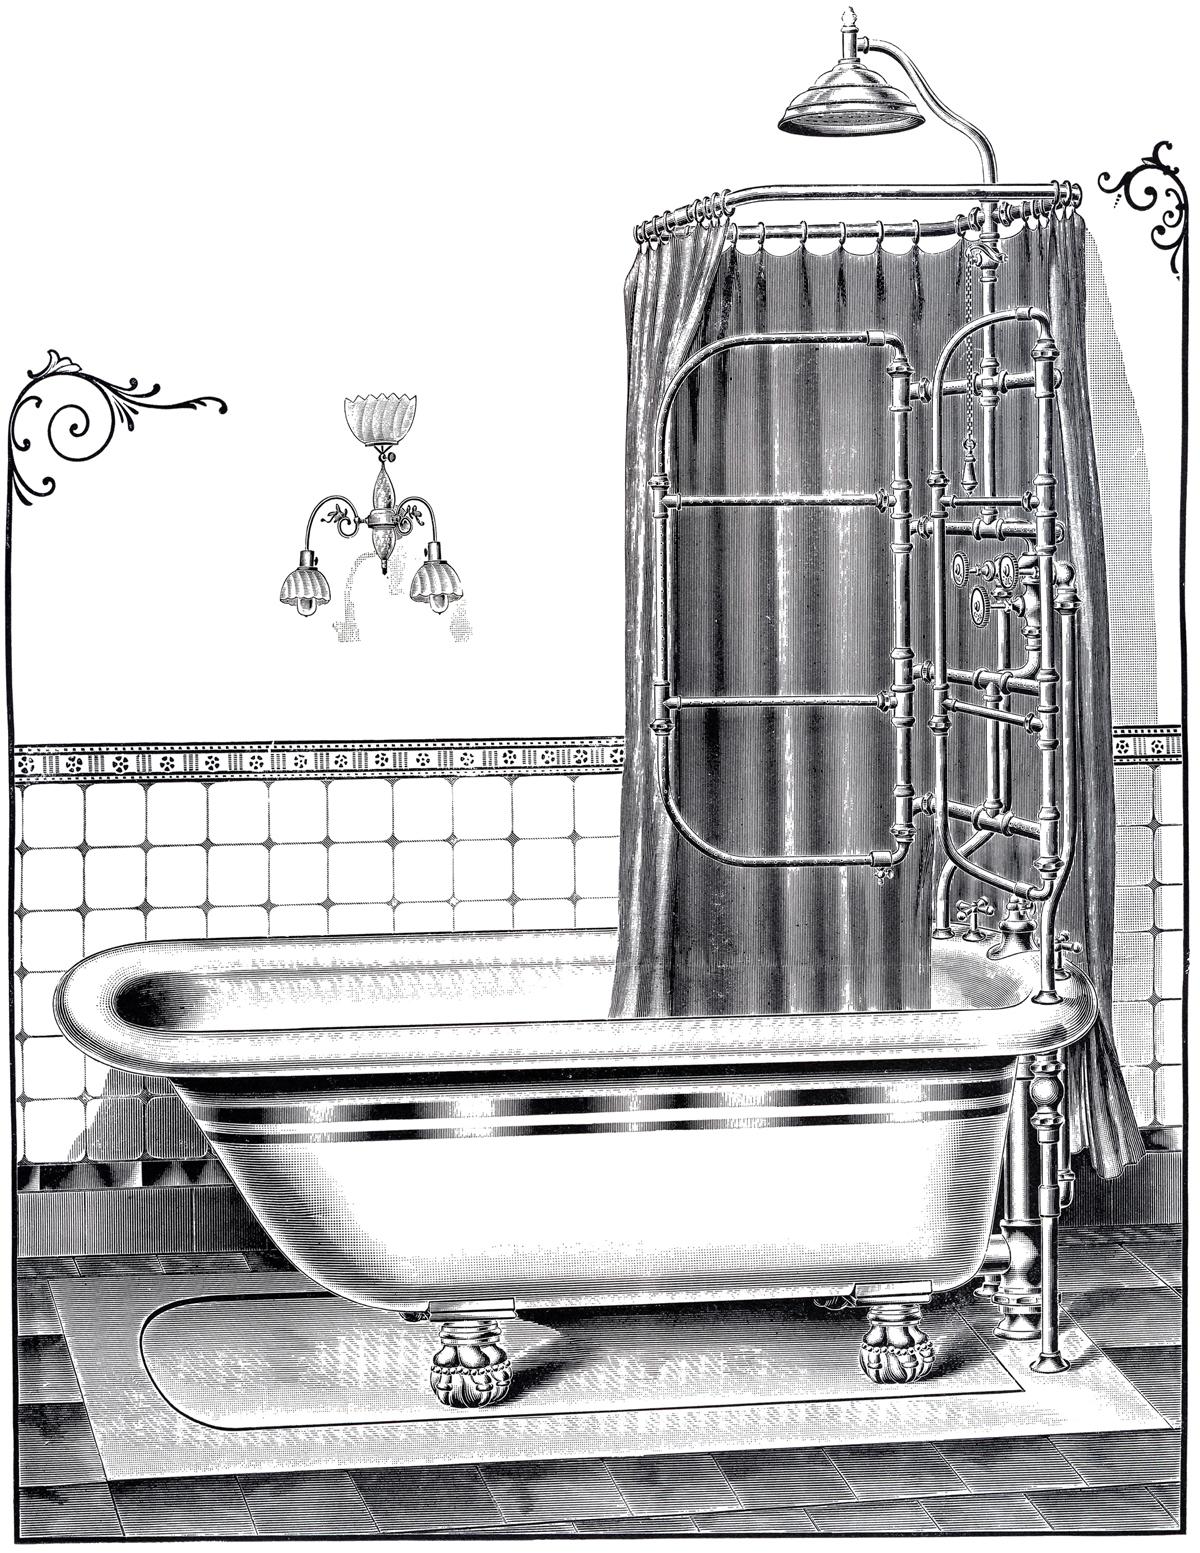 Bath clipart old fashioned. Vintage bathtub printable the